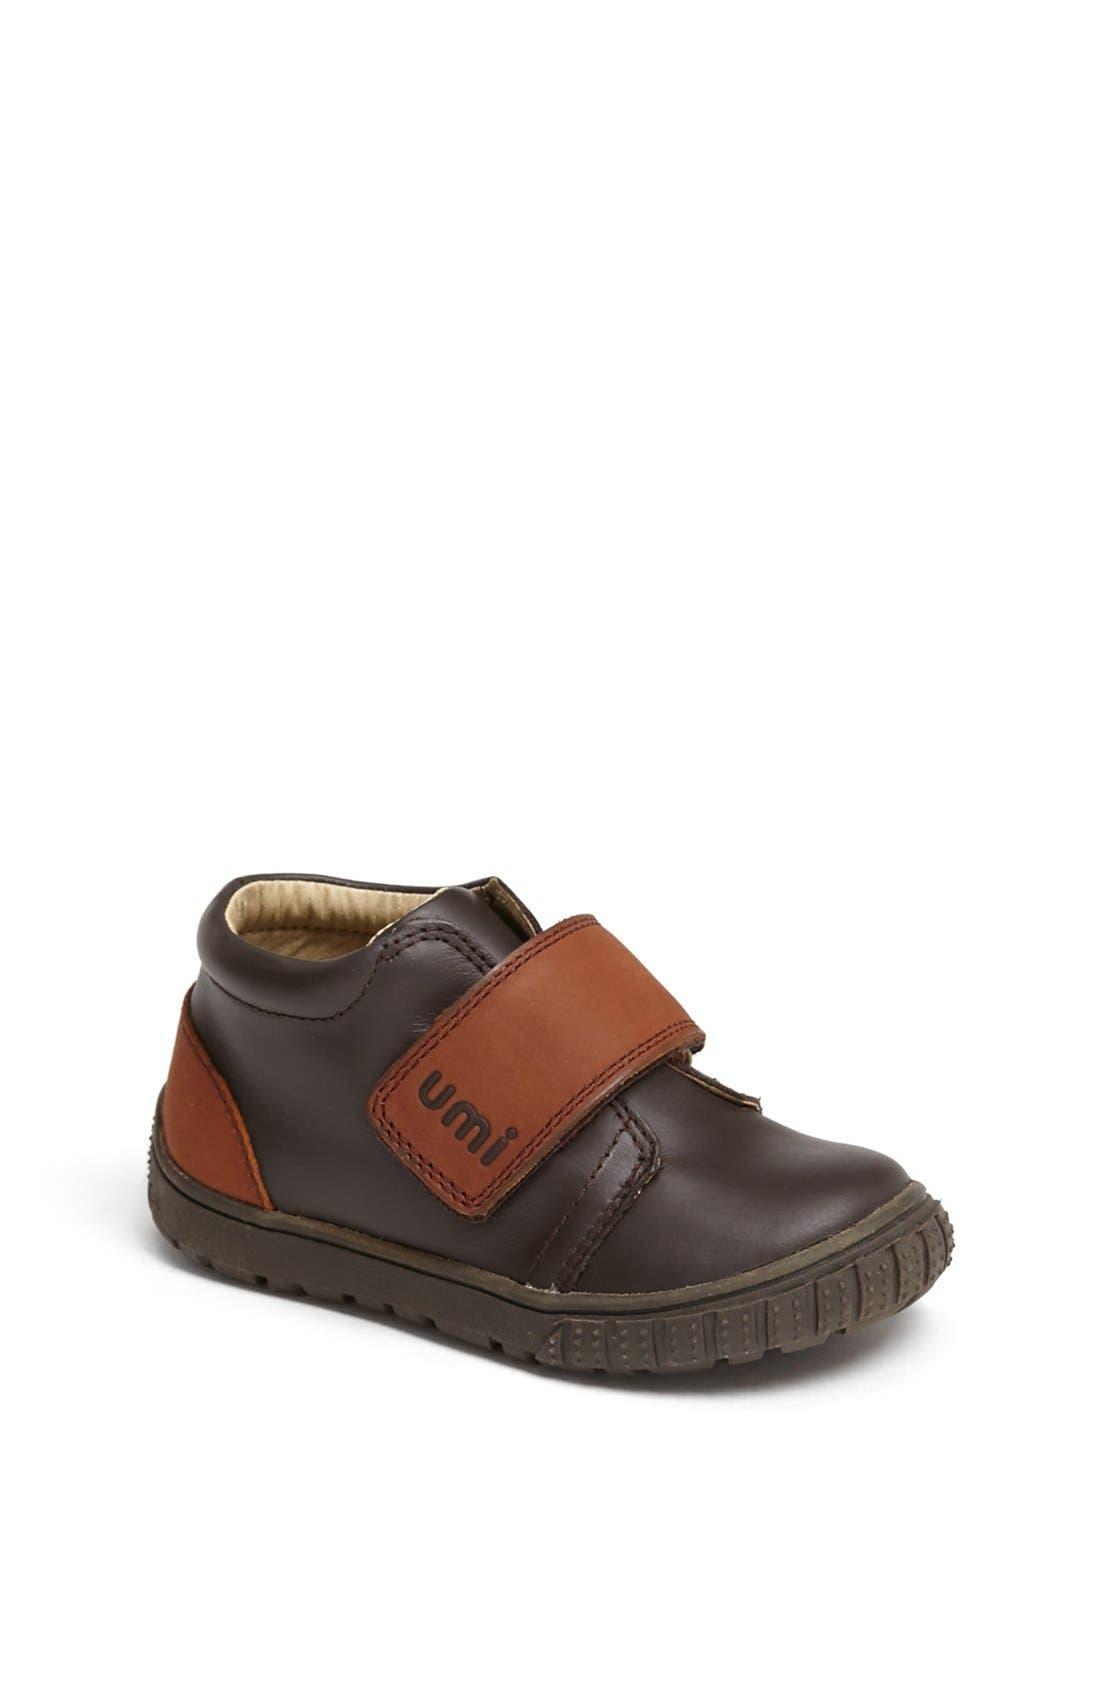 Alternate Image 1 Selected - Umi 'Bodi' Dress Boot (Walker & Toddler)